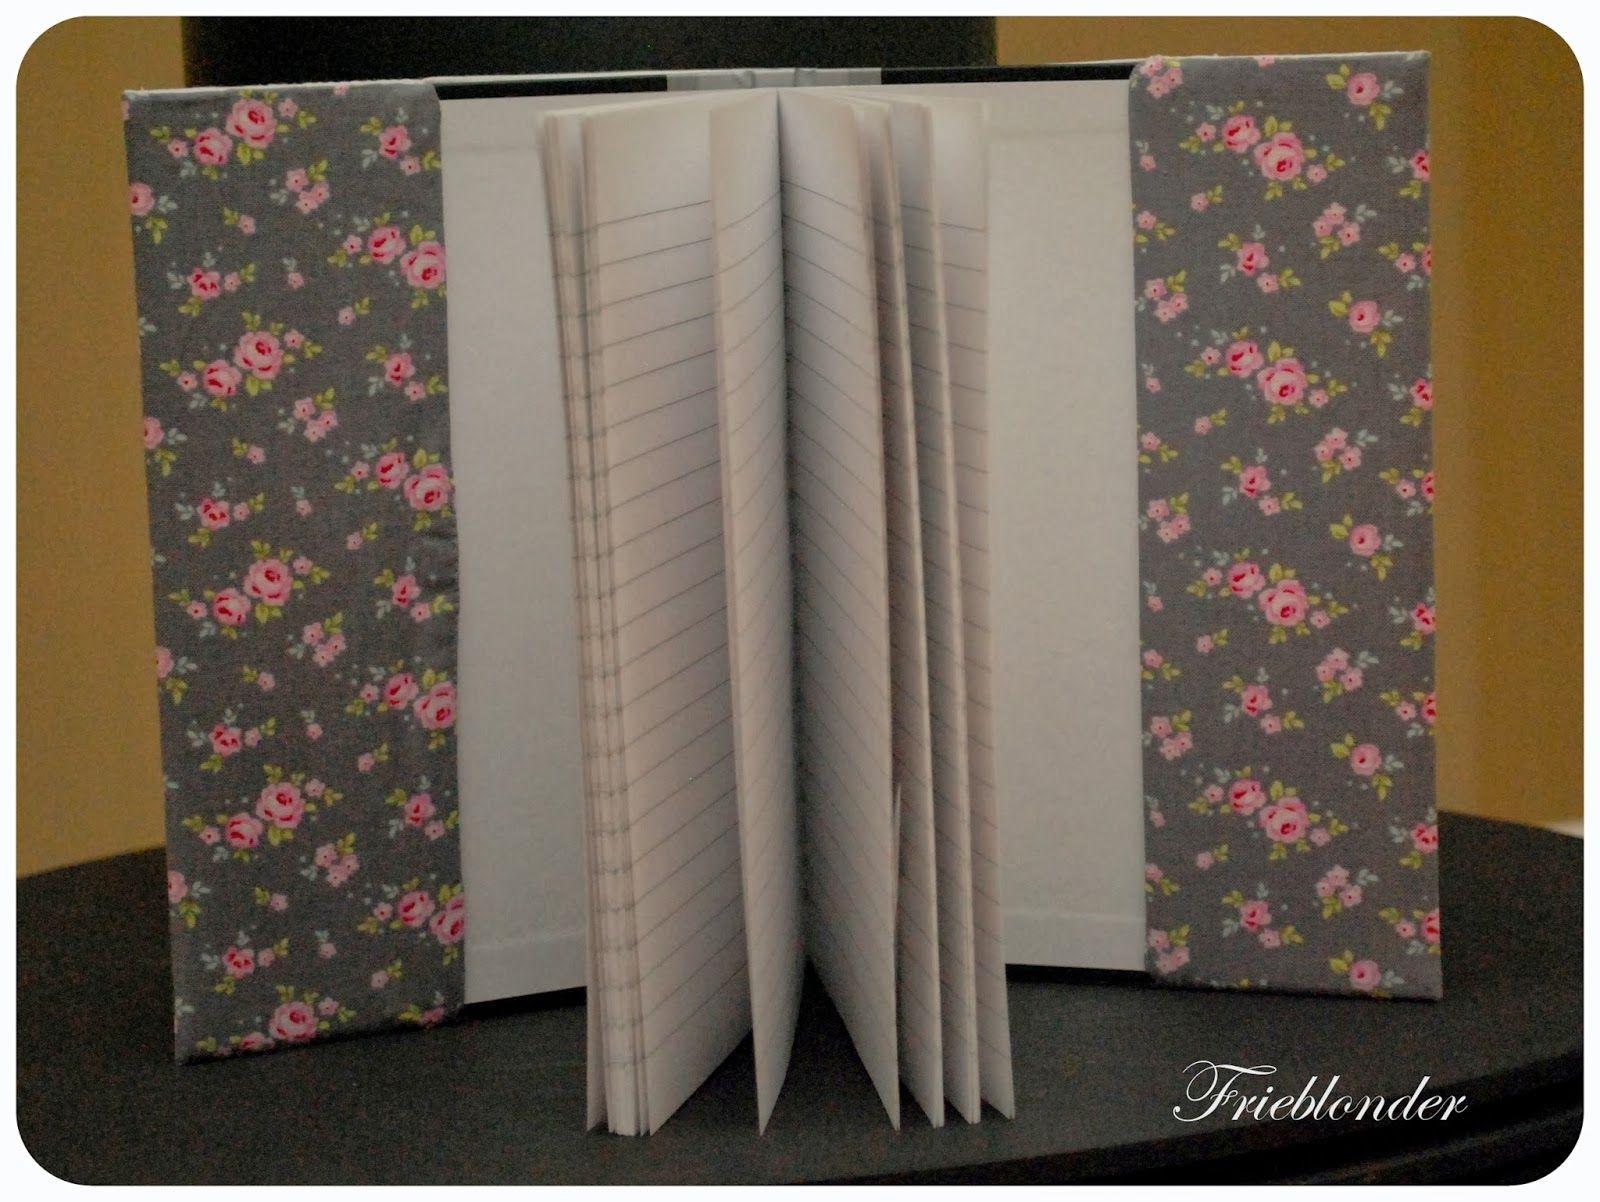 Frieblonder: Notatbok med stoffomslag